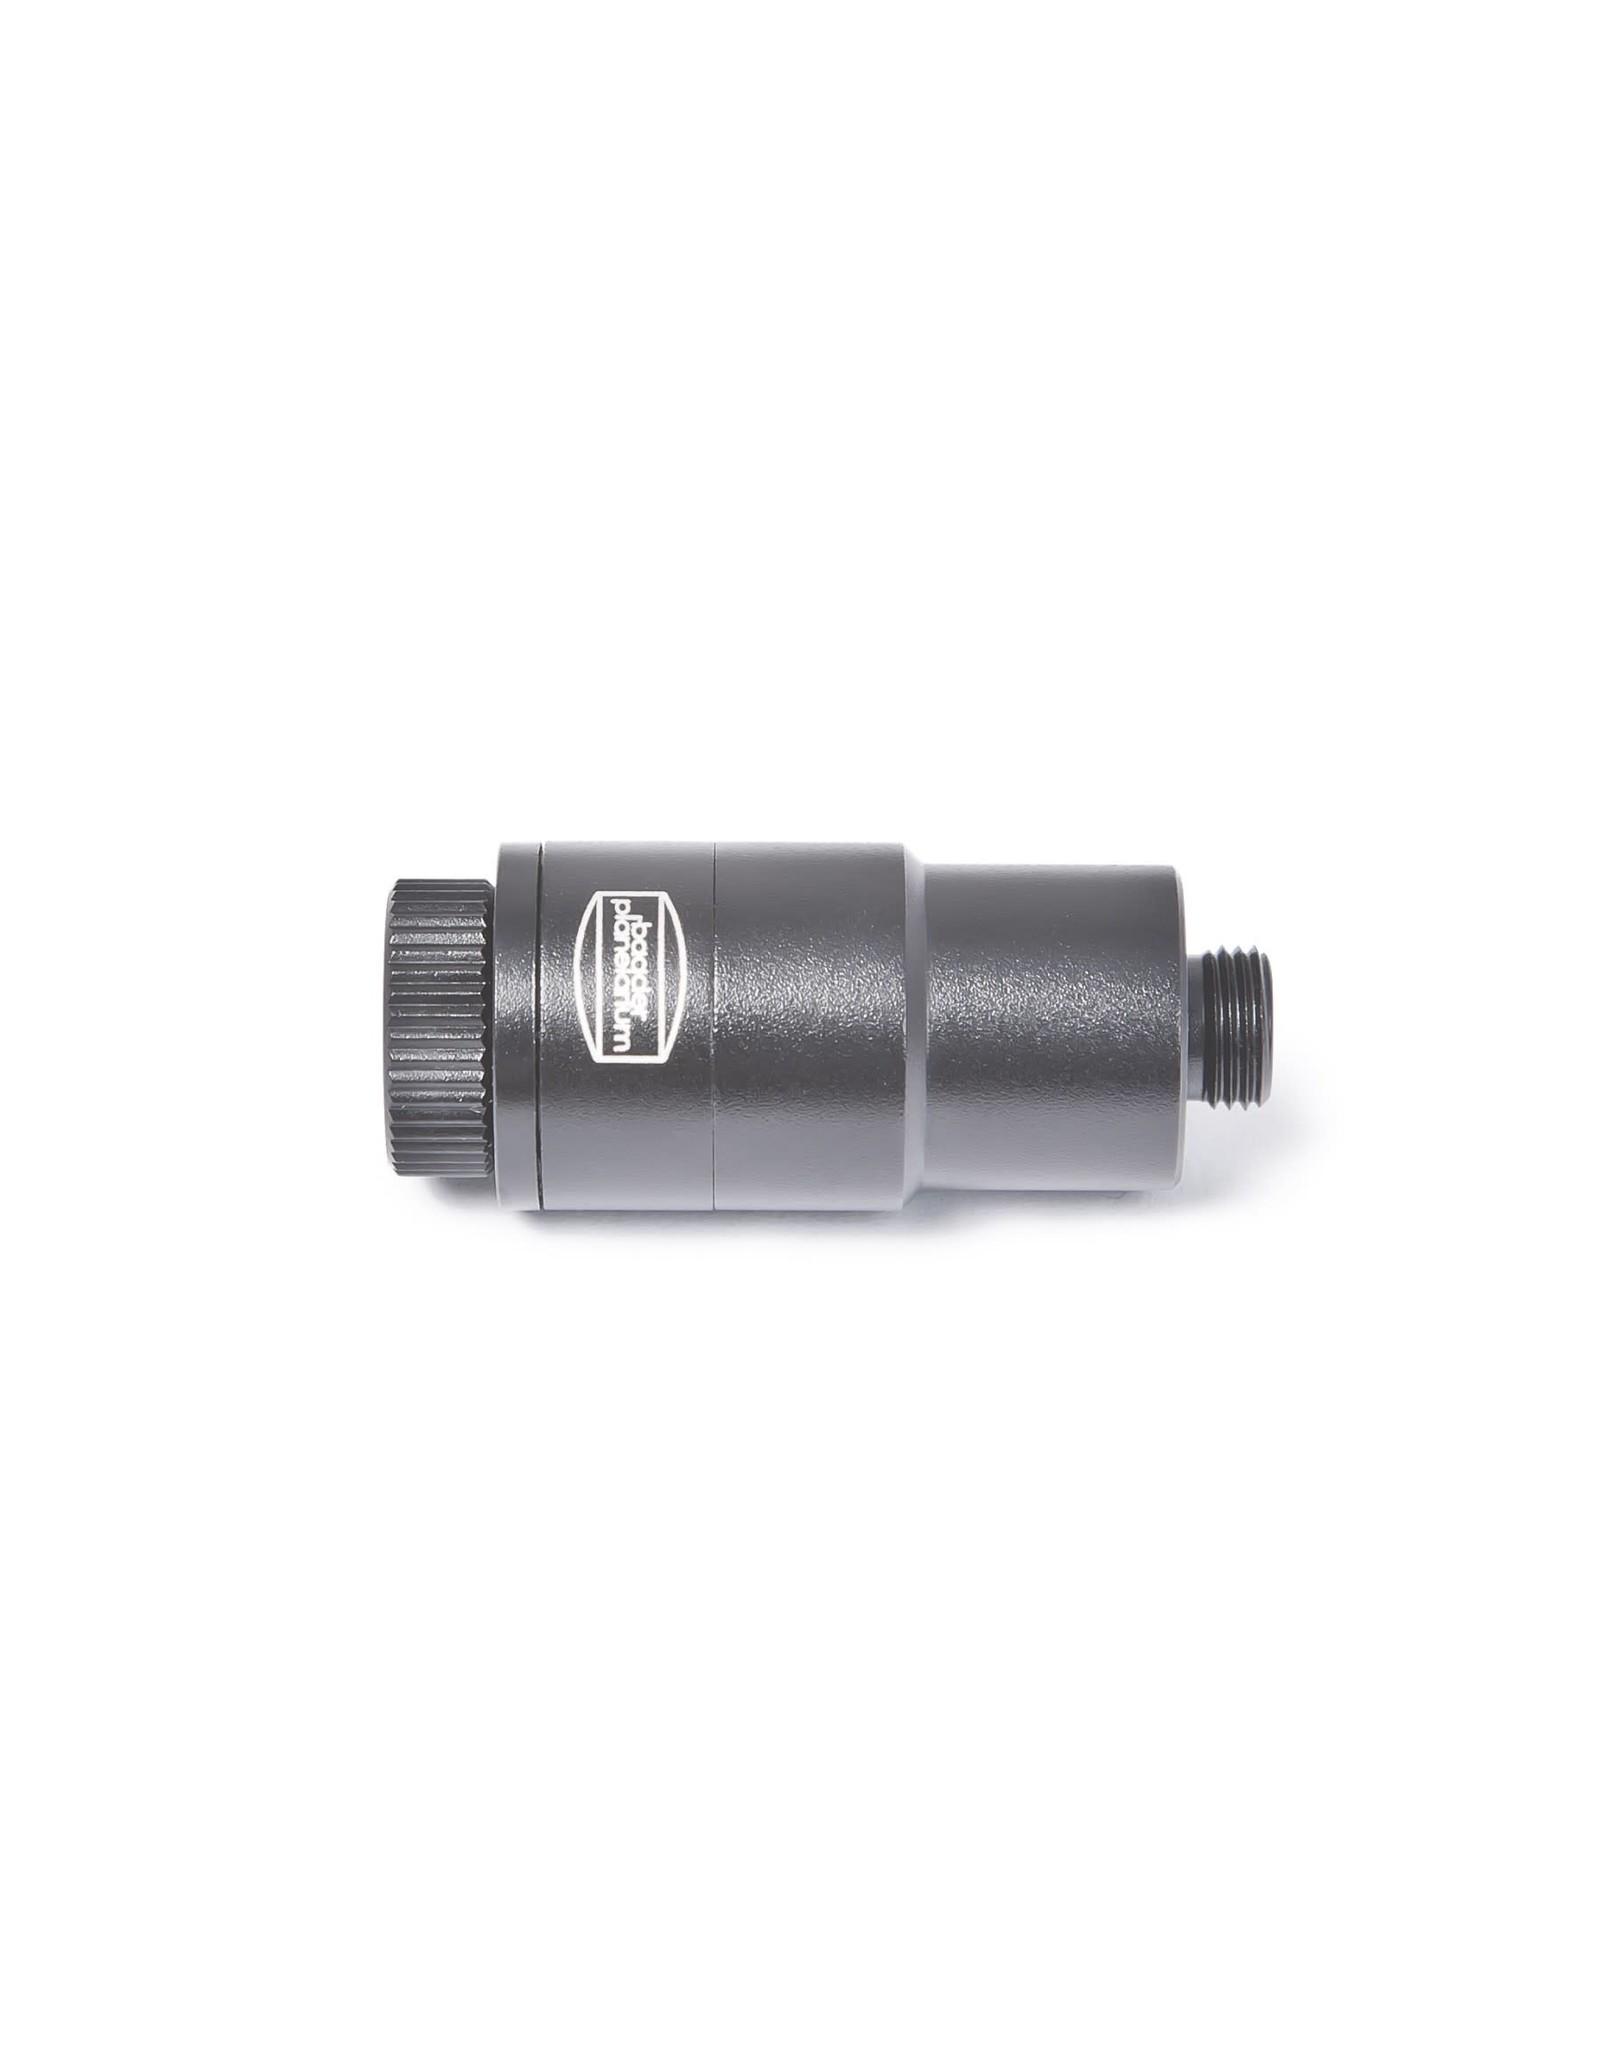 Baader Planetarium Baader Micro Guide eyepiece with Log-Pot illuminator